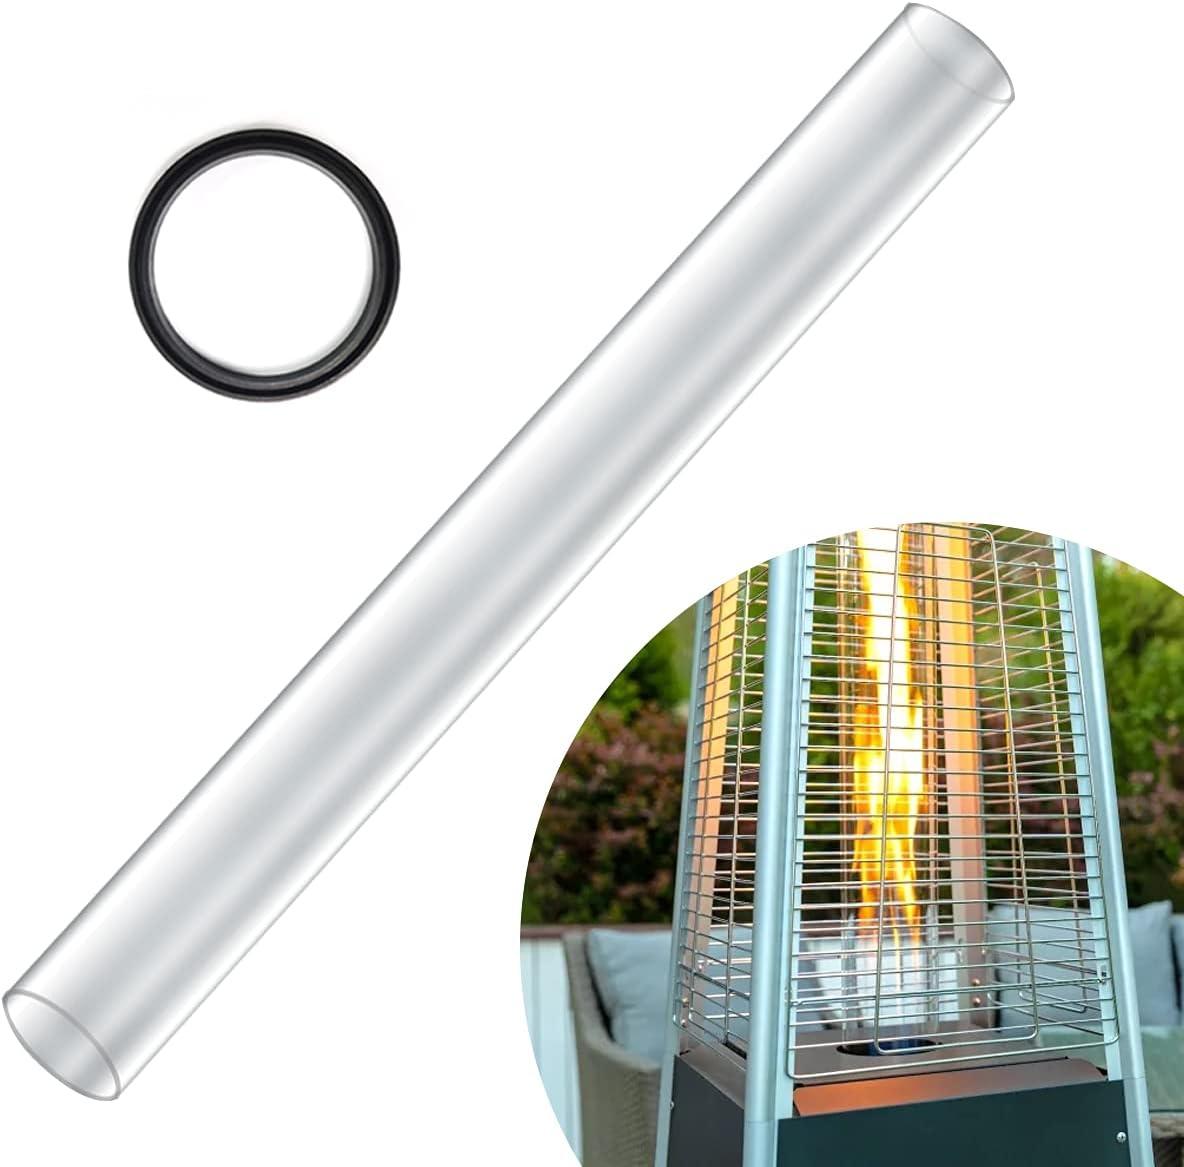 Kisworm Pyramid Patio Heater Glass Outdoor Same Sale day shipping Quartz Tube for